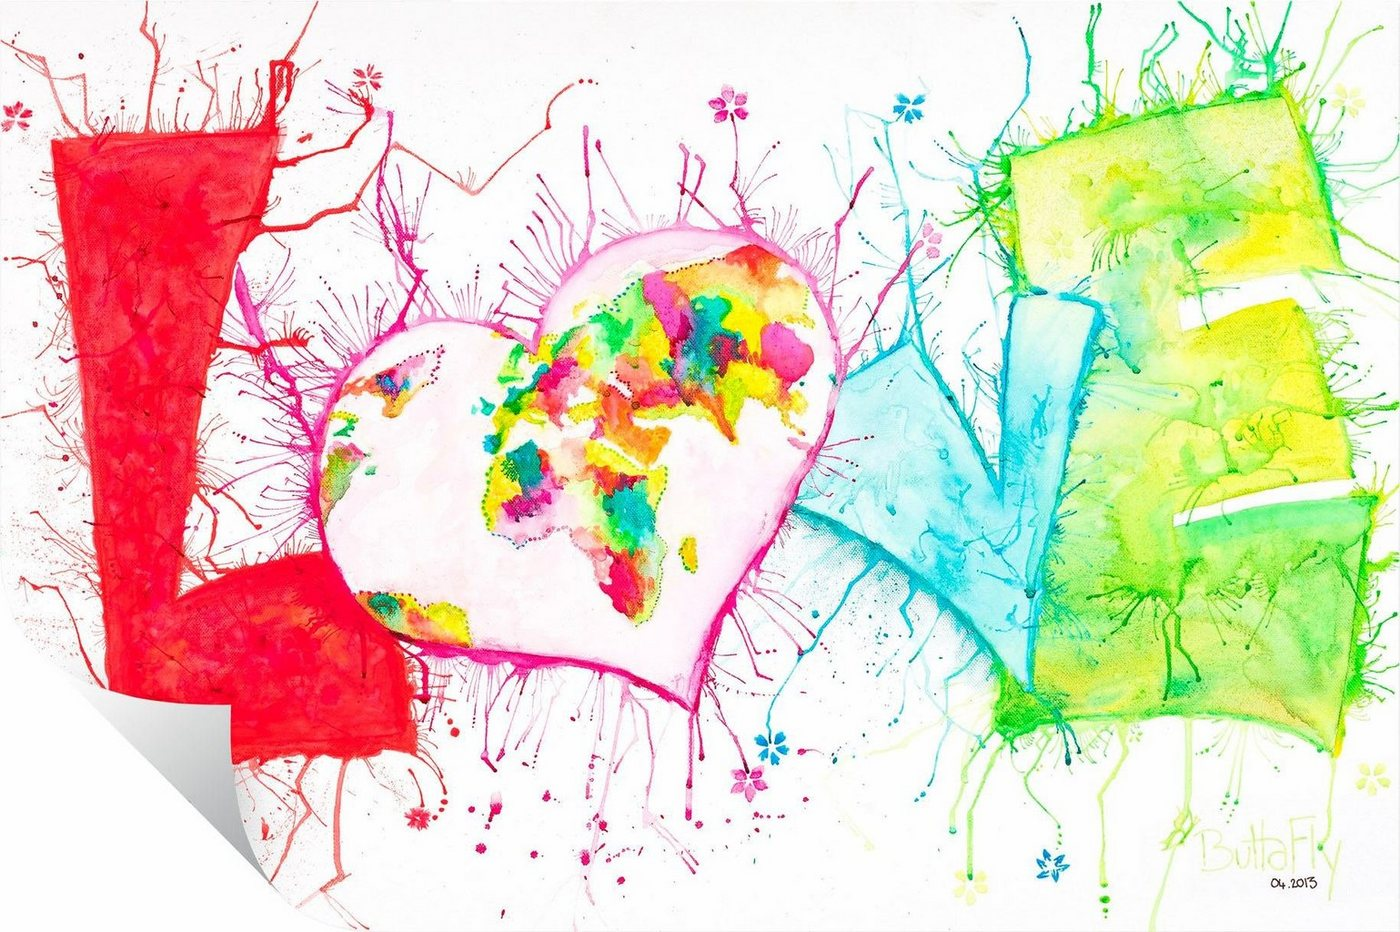 Wallprint »Buttafly - Love«, 80/50 cm | Dekoration > Wandtattoos > Wallprints | Bunt | Kunststoff